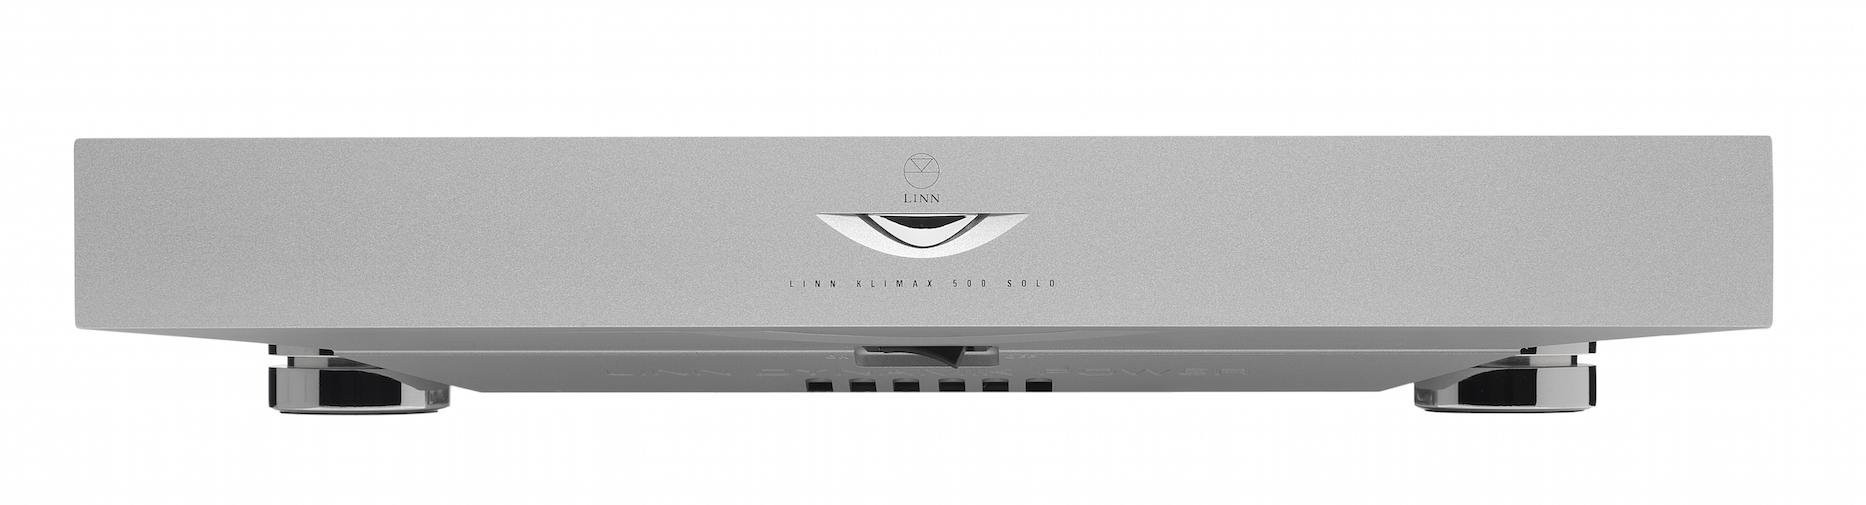 Linn Klimax 500 Solo Mono Verstärker 1 x 500W, Audio Visual Factory